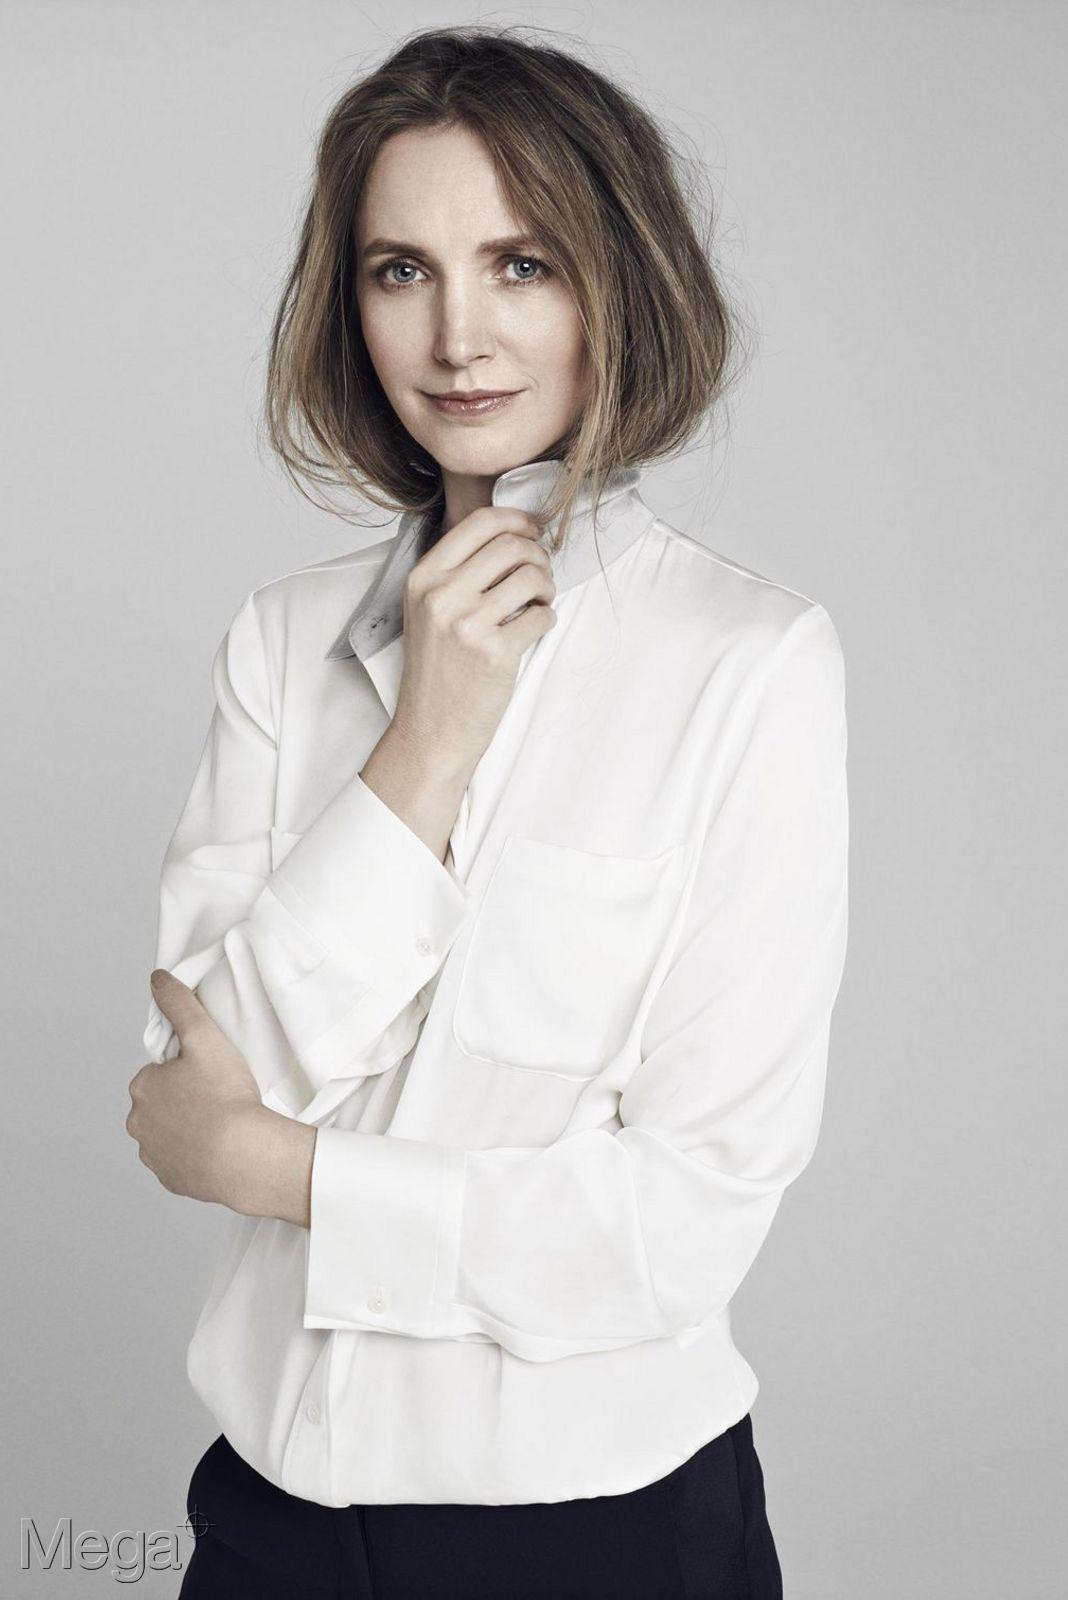 Cecilia Chancellor Mega Model Agency